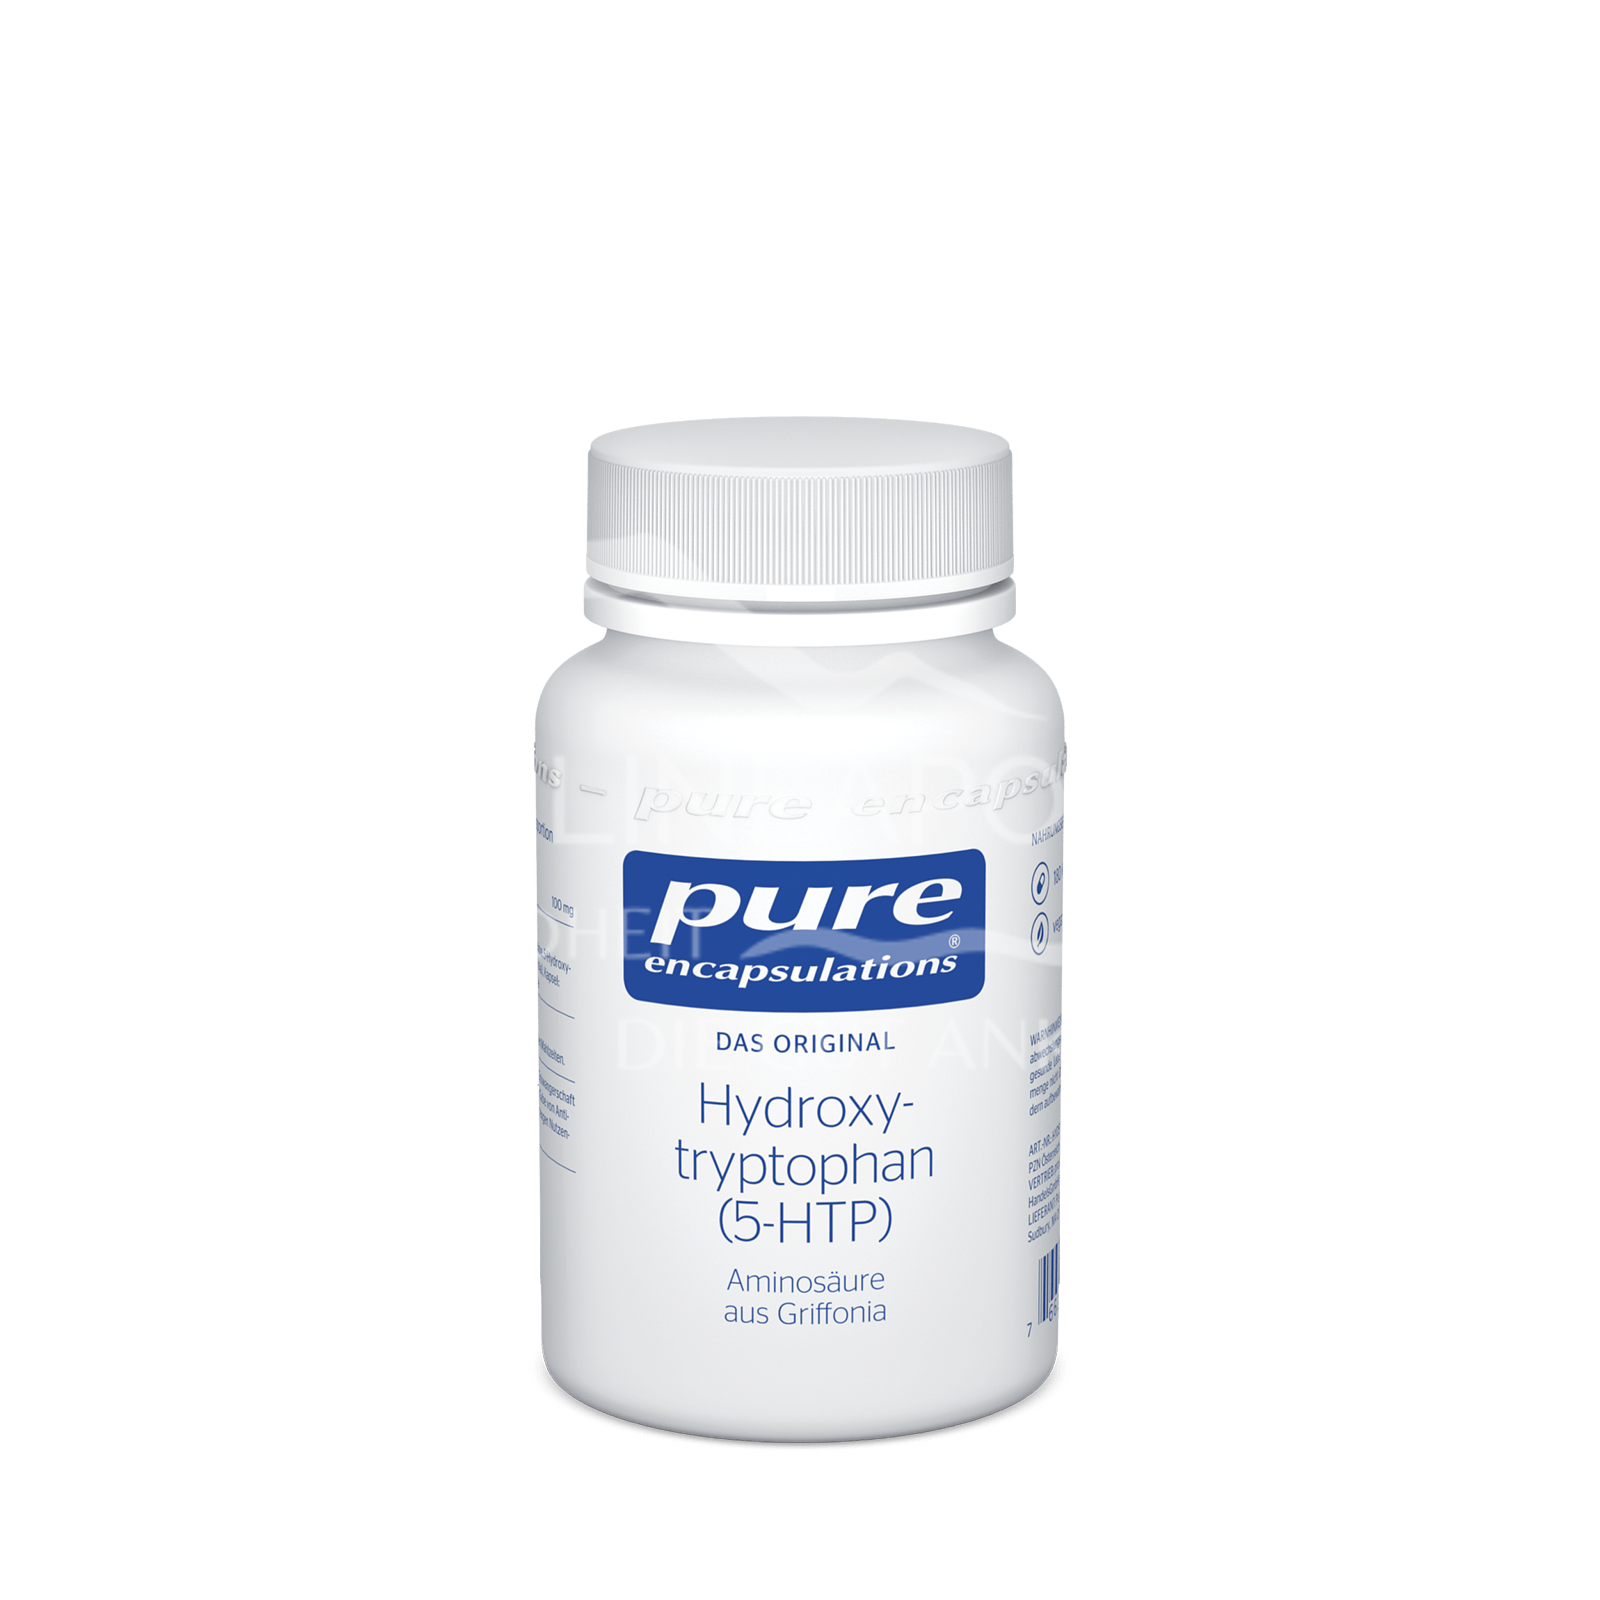 pure encapsulations® Hydroxytryptophan (5-HTP)